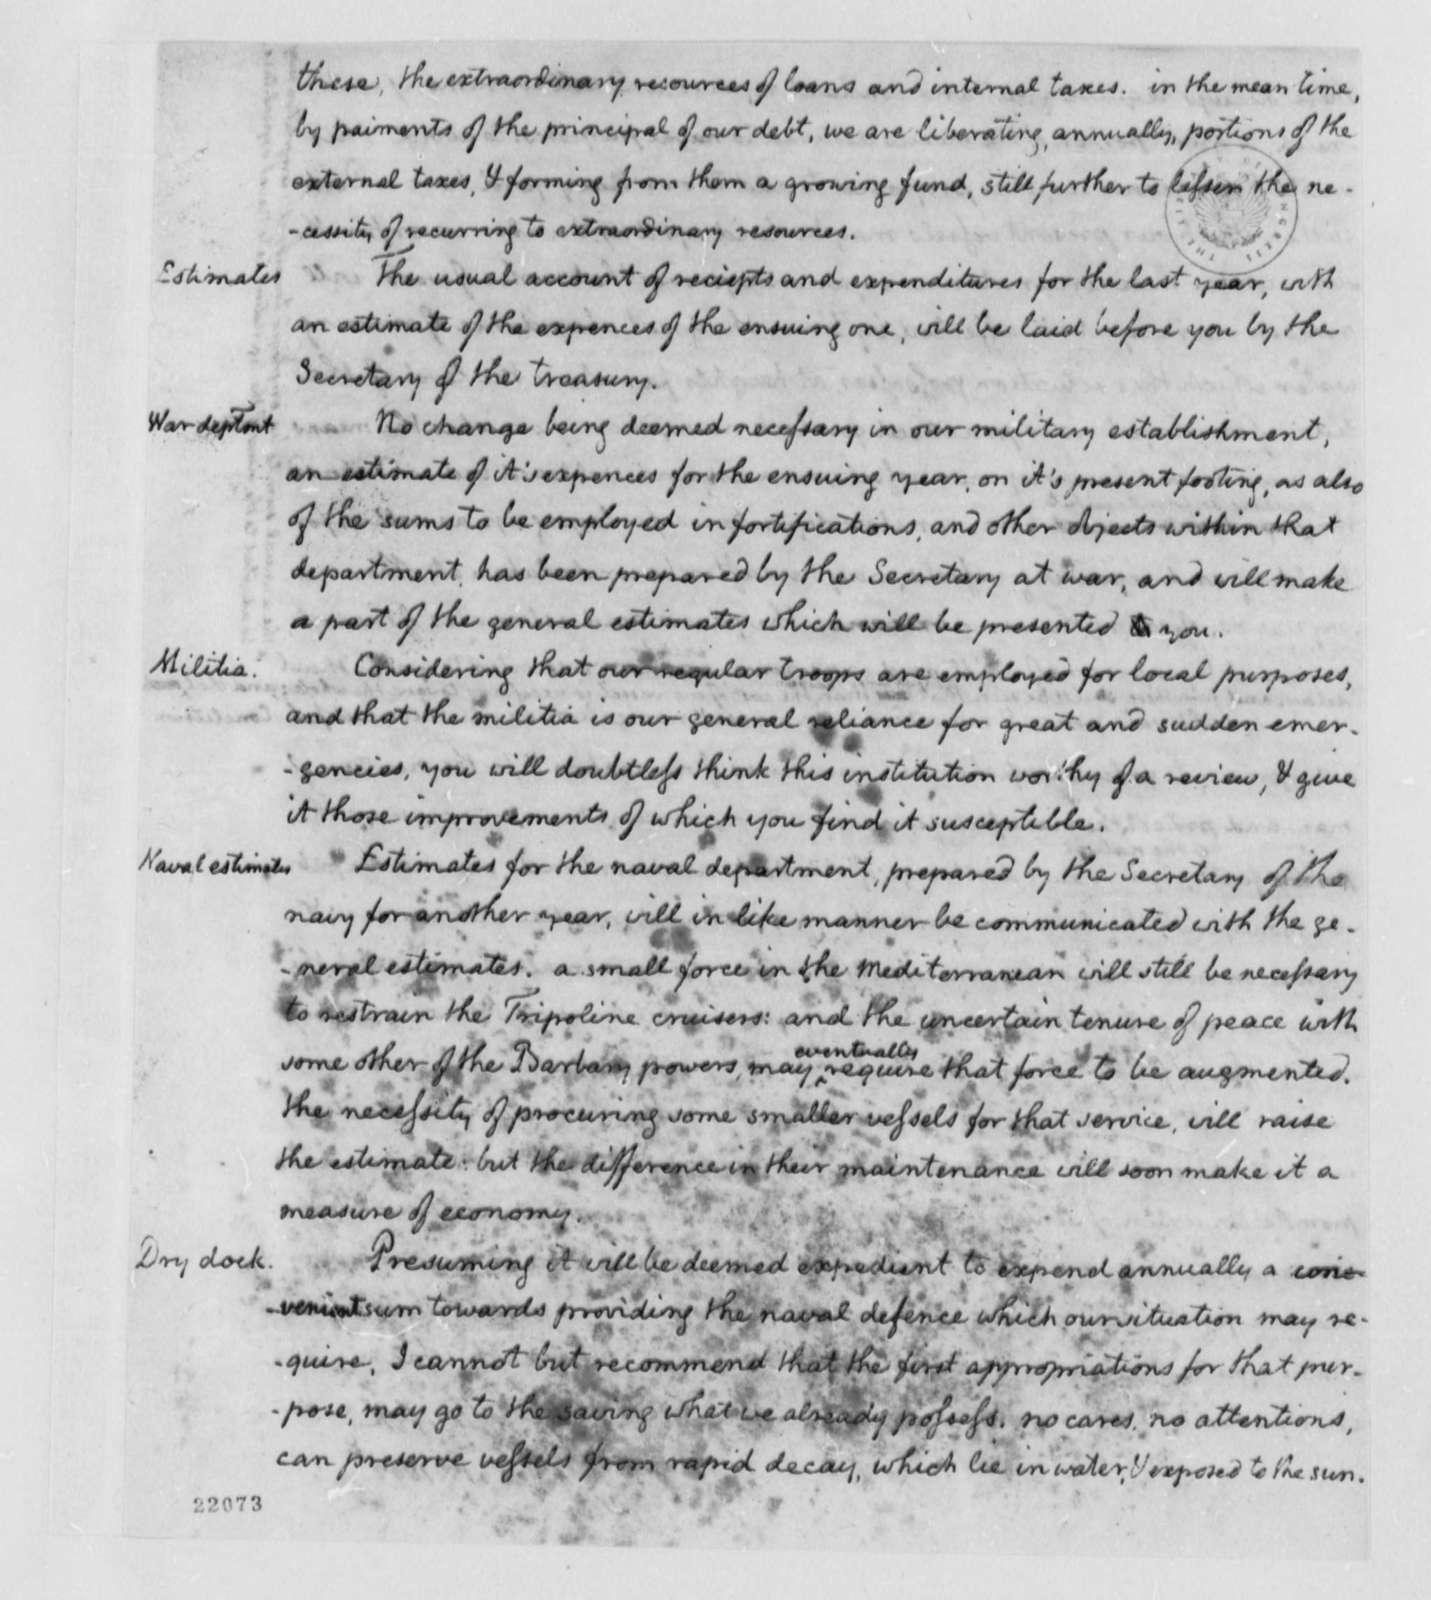 Thomas Jefferson, December 15, 1802, Annual Message